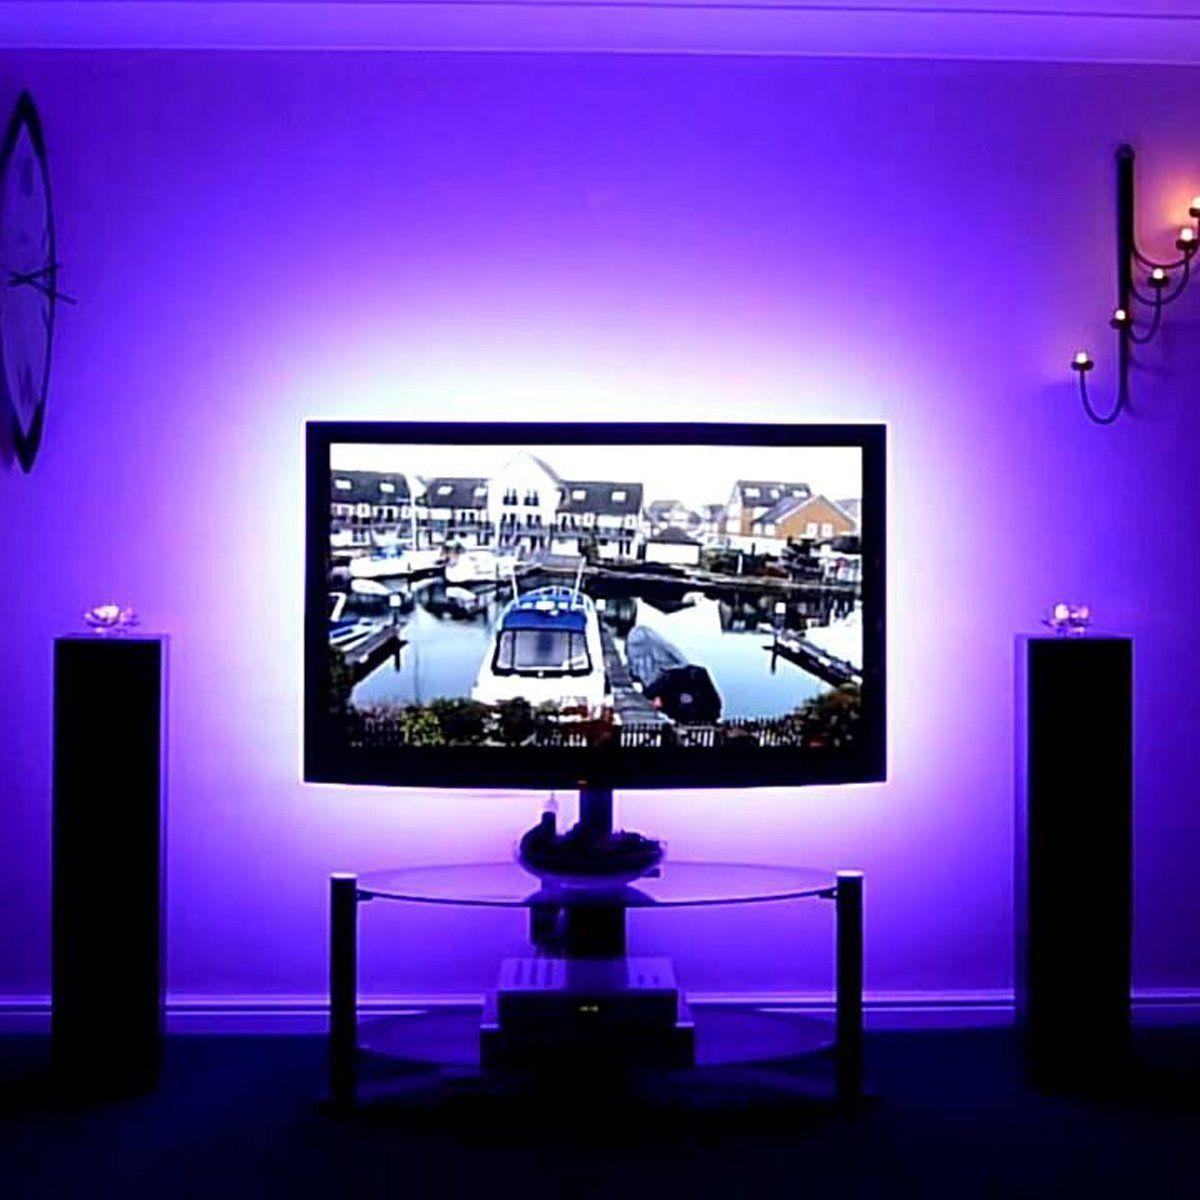 LE 16.4ft Smart Waterproof Color Changing LED Strip Light